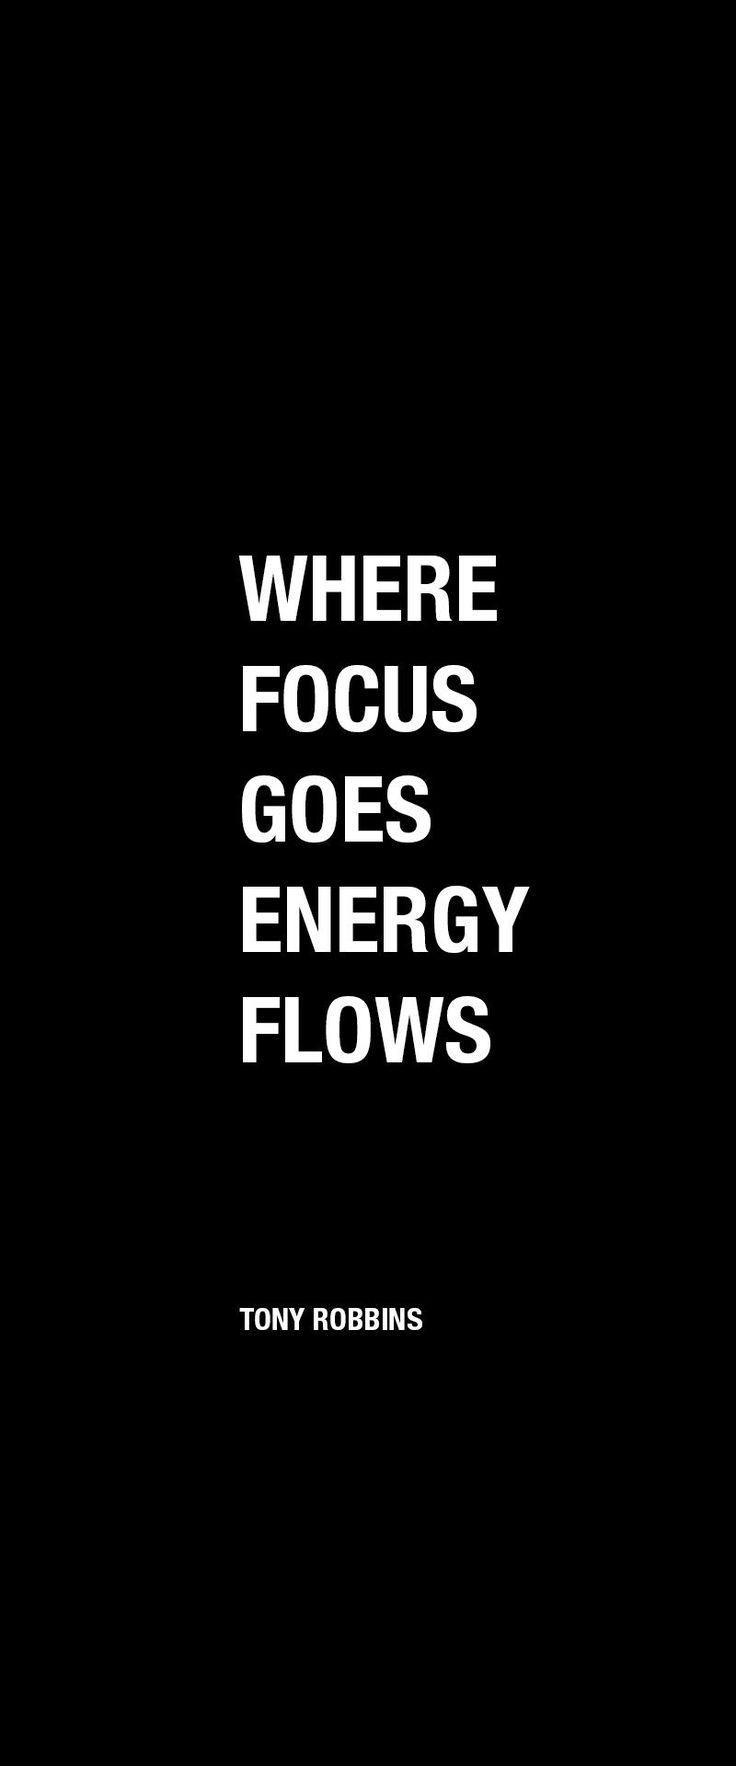 This. #motivation #abundance #quotes